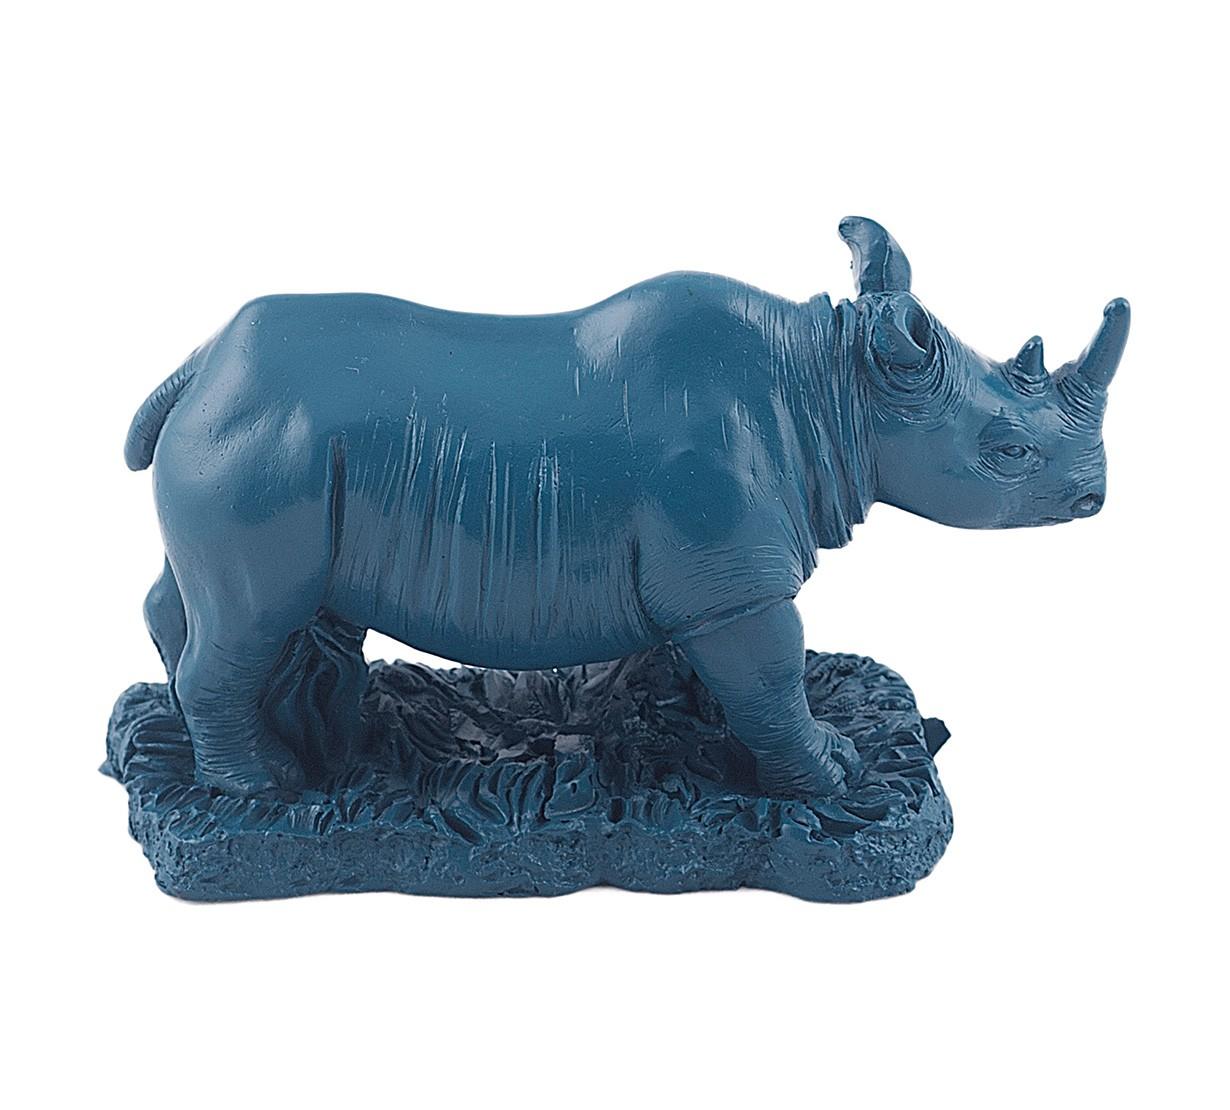 Rinocer Albastru - marime medie